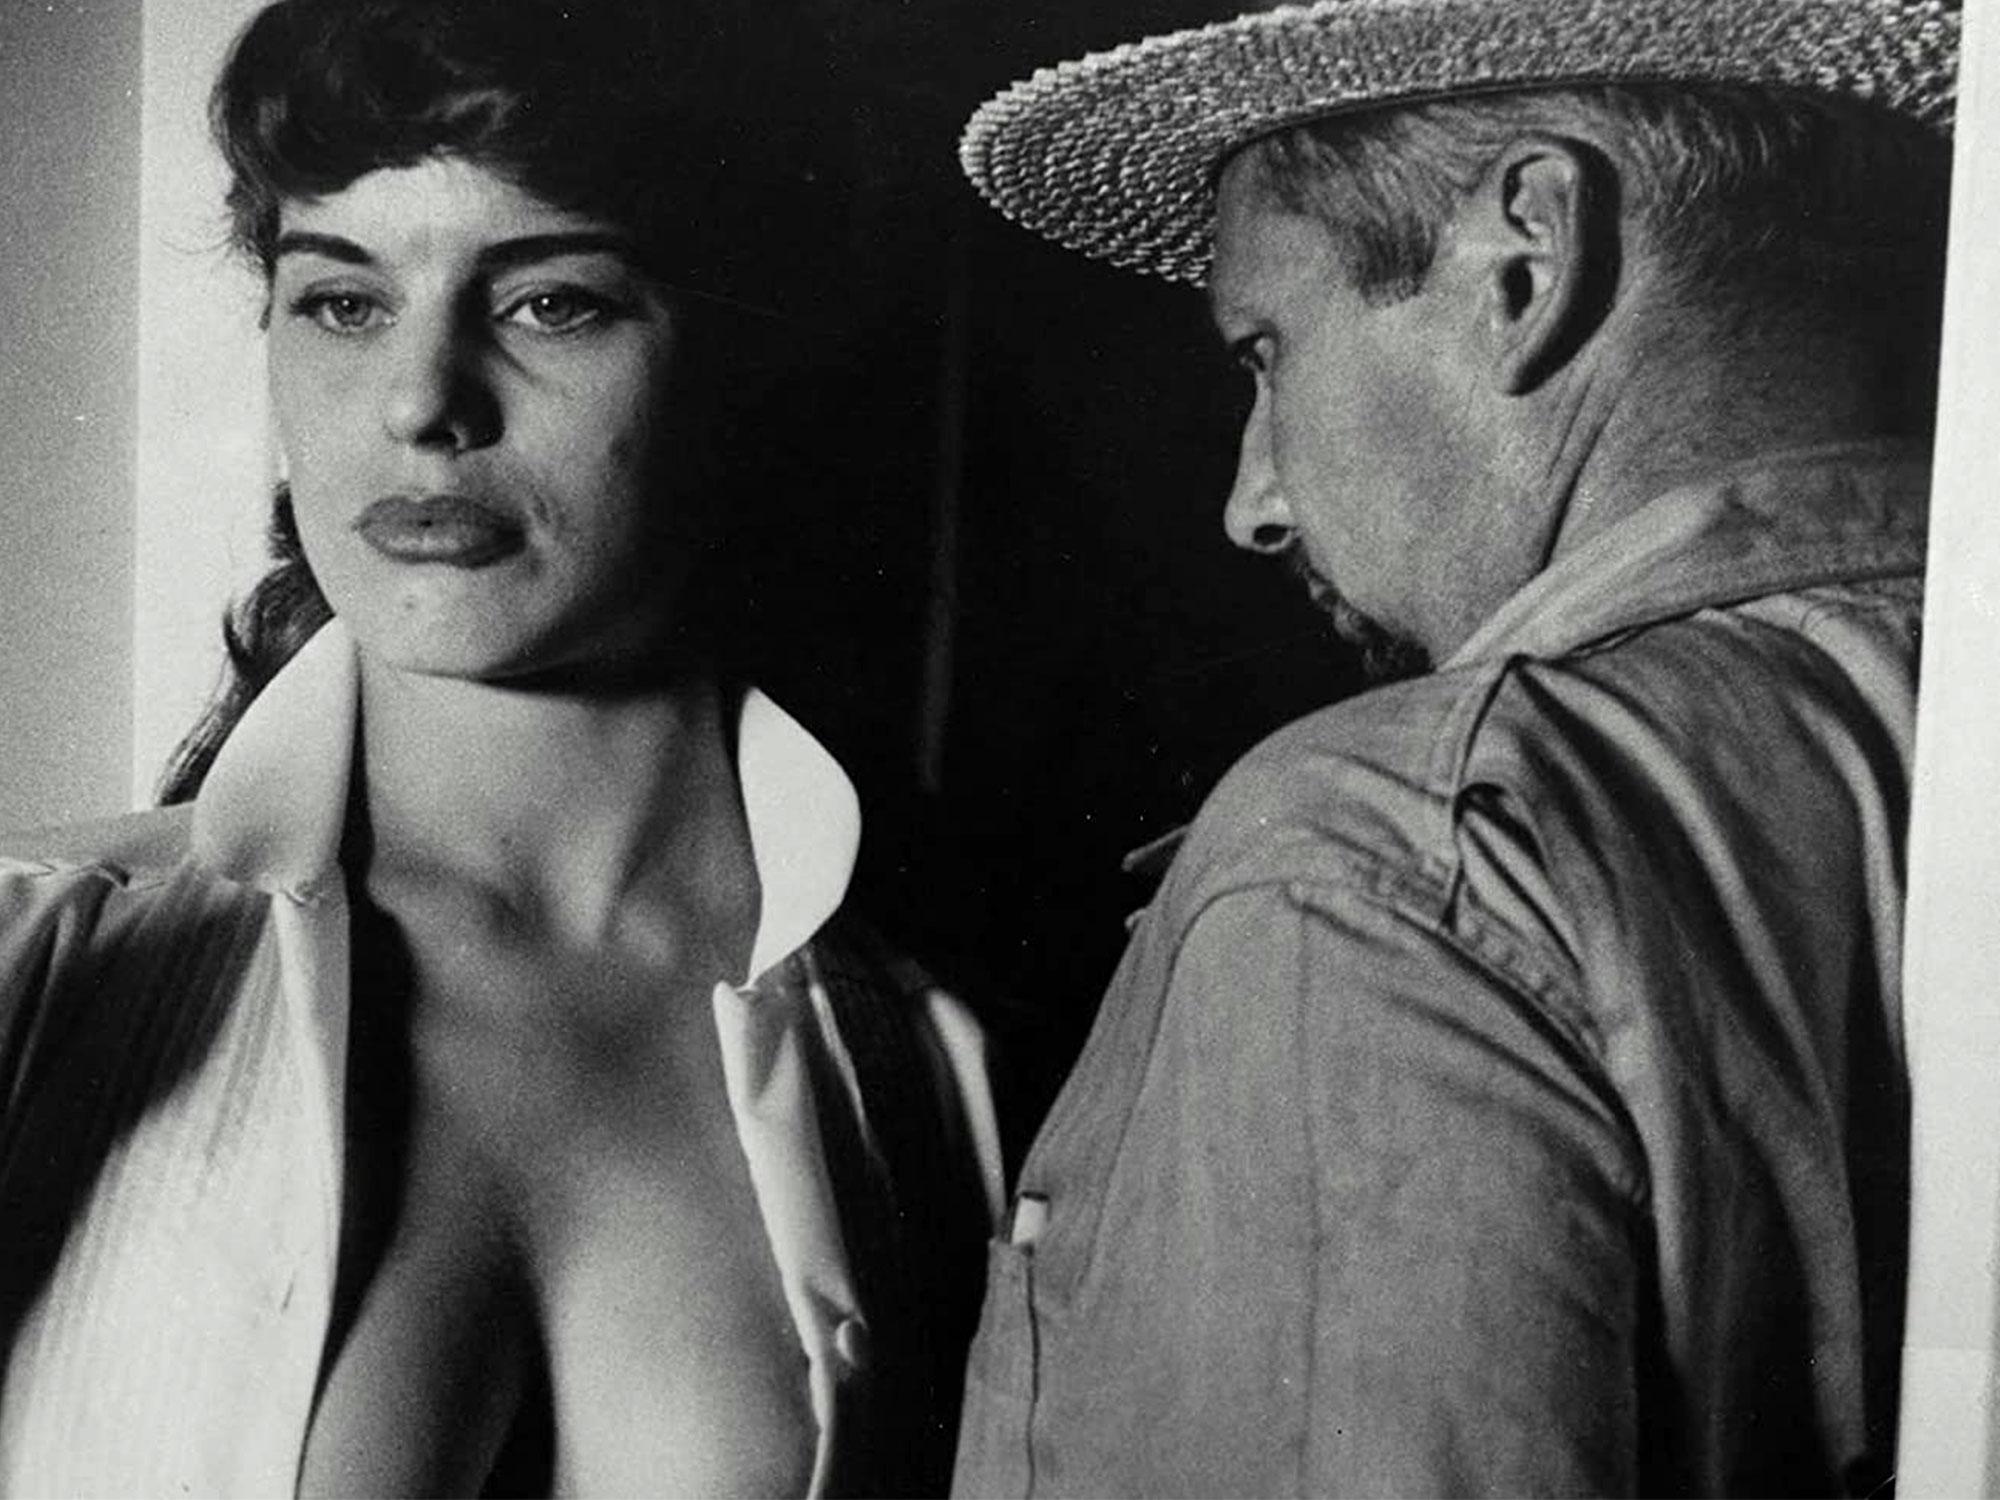 The Immoral Mr Teas (1959)